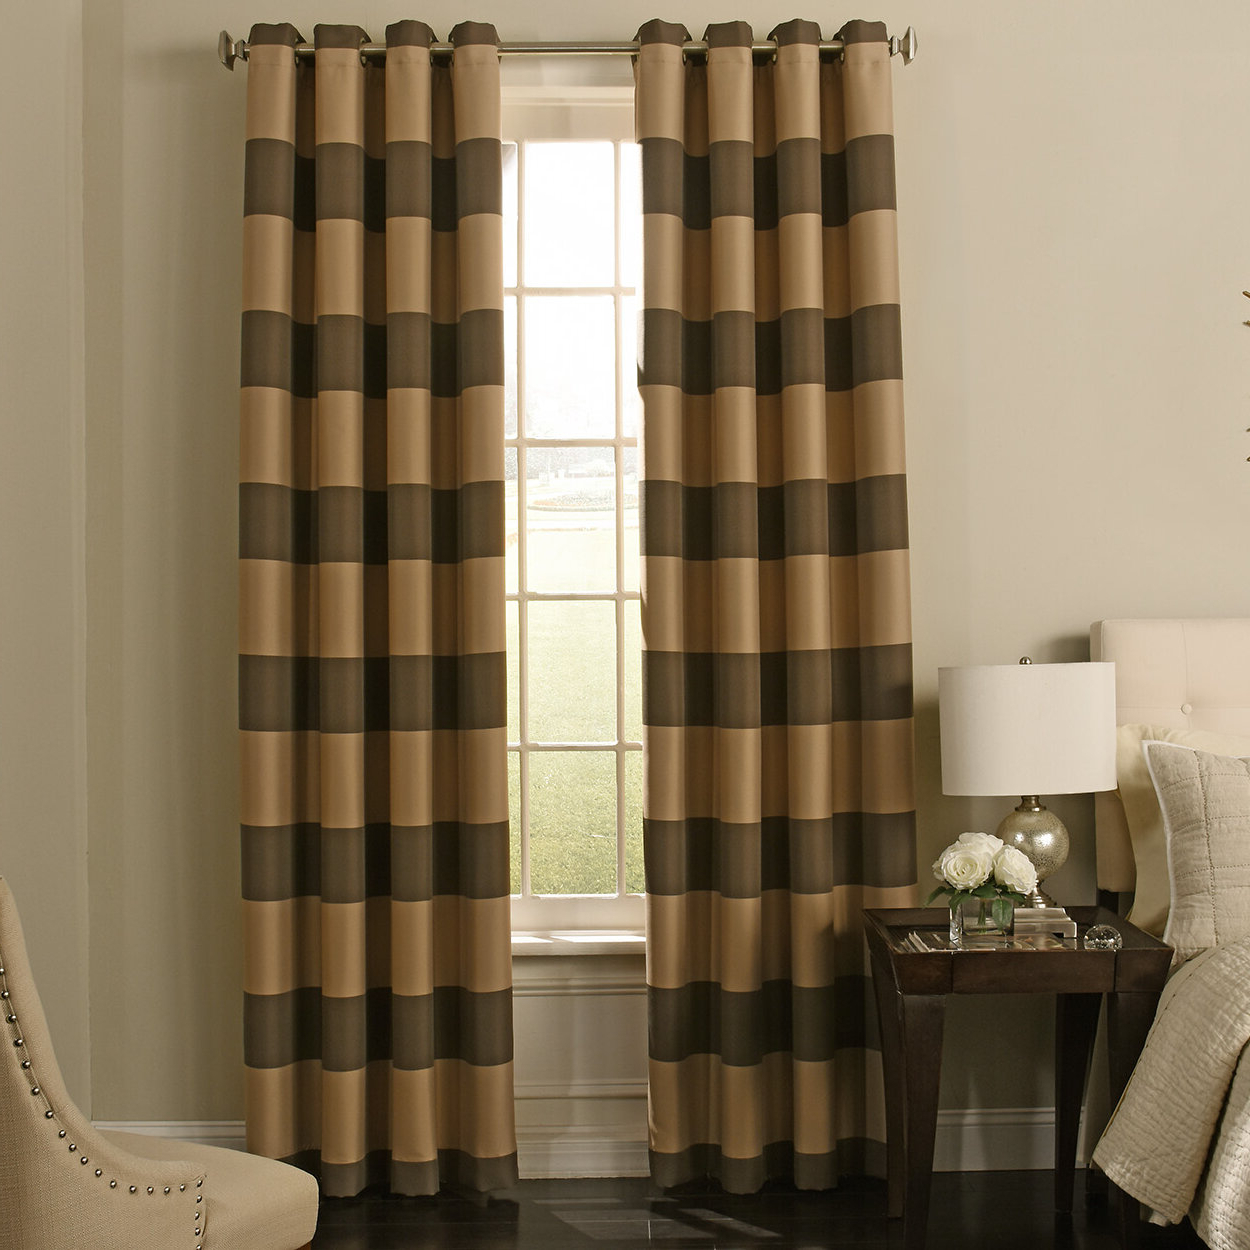 Gaultier Striped Max Blackout Grommet Single Curtain Panel Regarding Recent Emily Sheer Voile Grommet Curtain Panels (View 19 of 20)